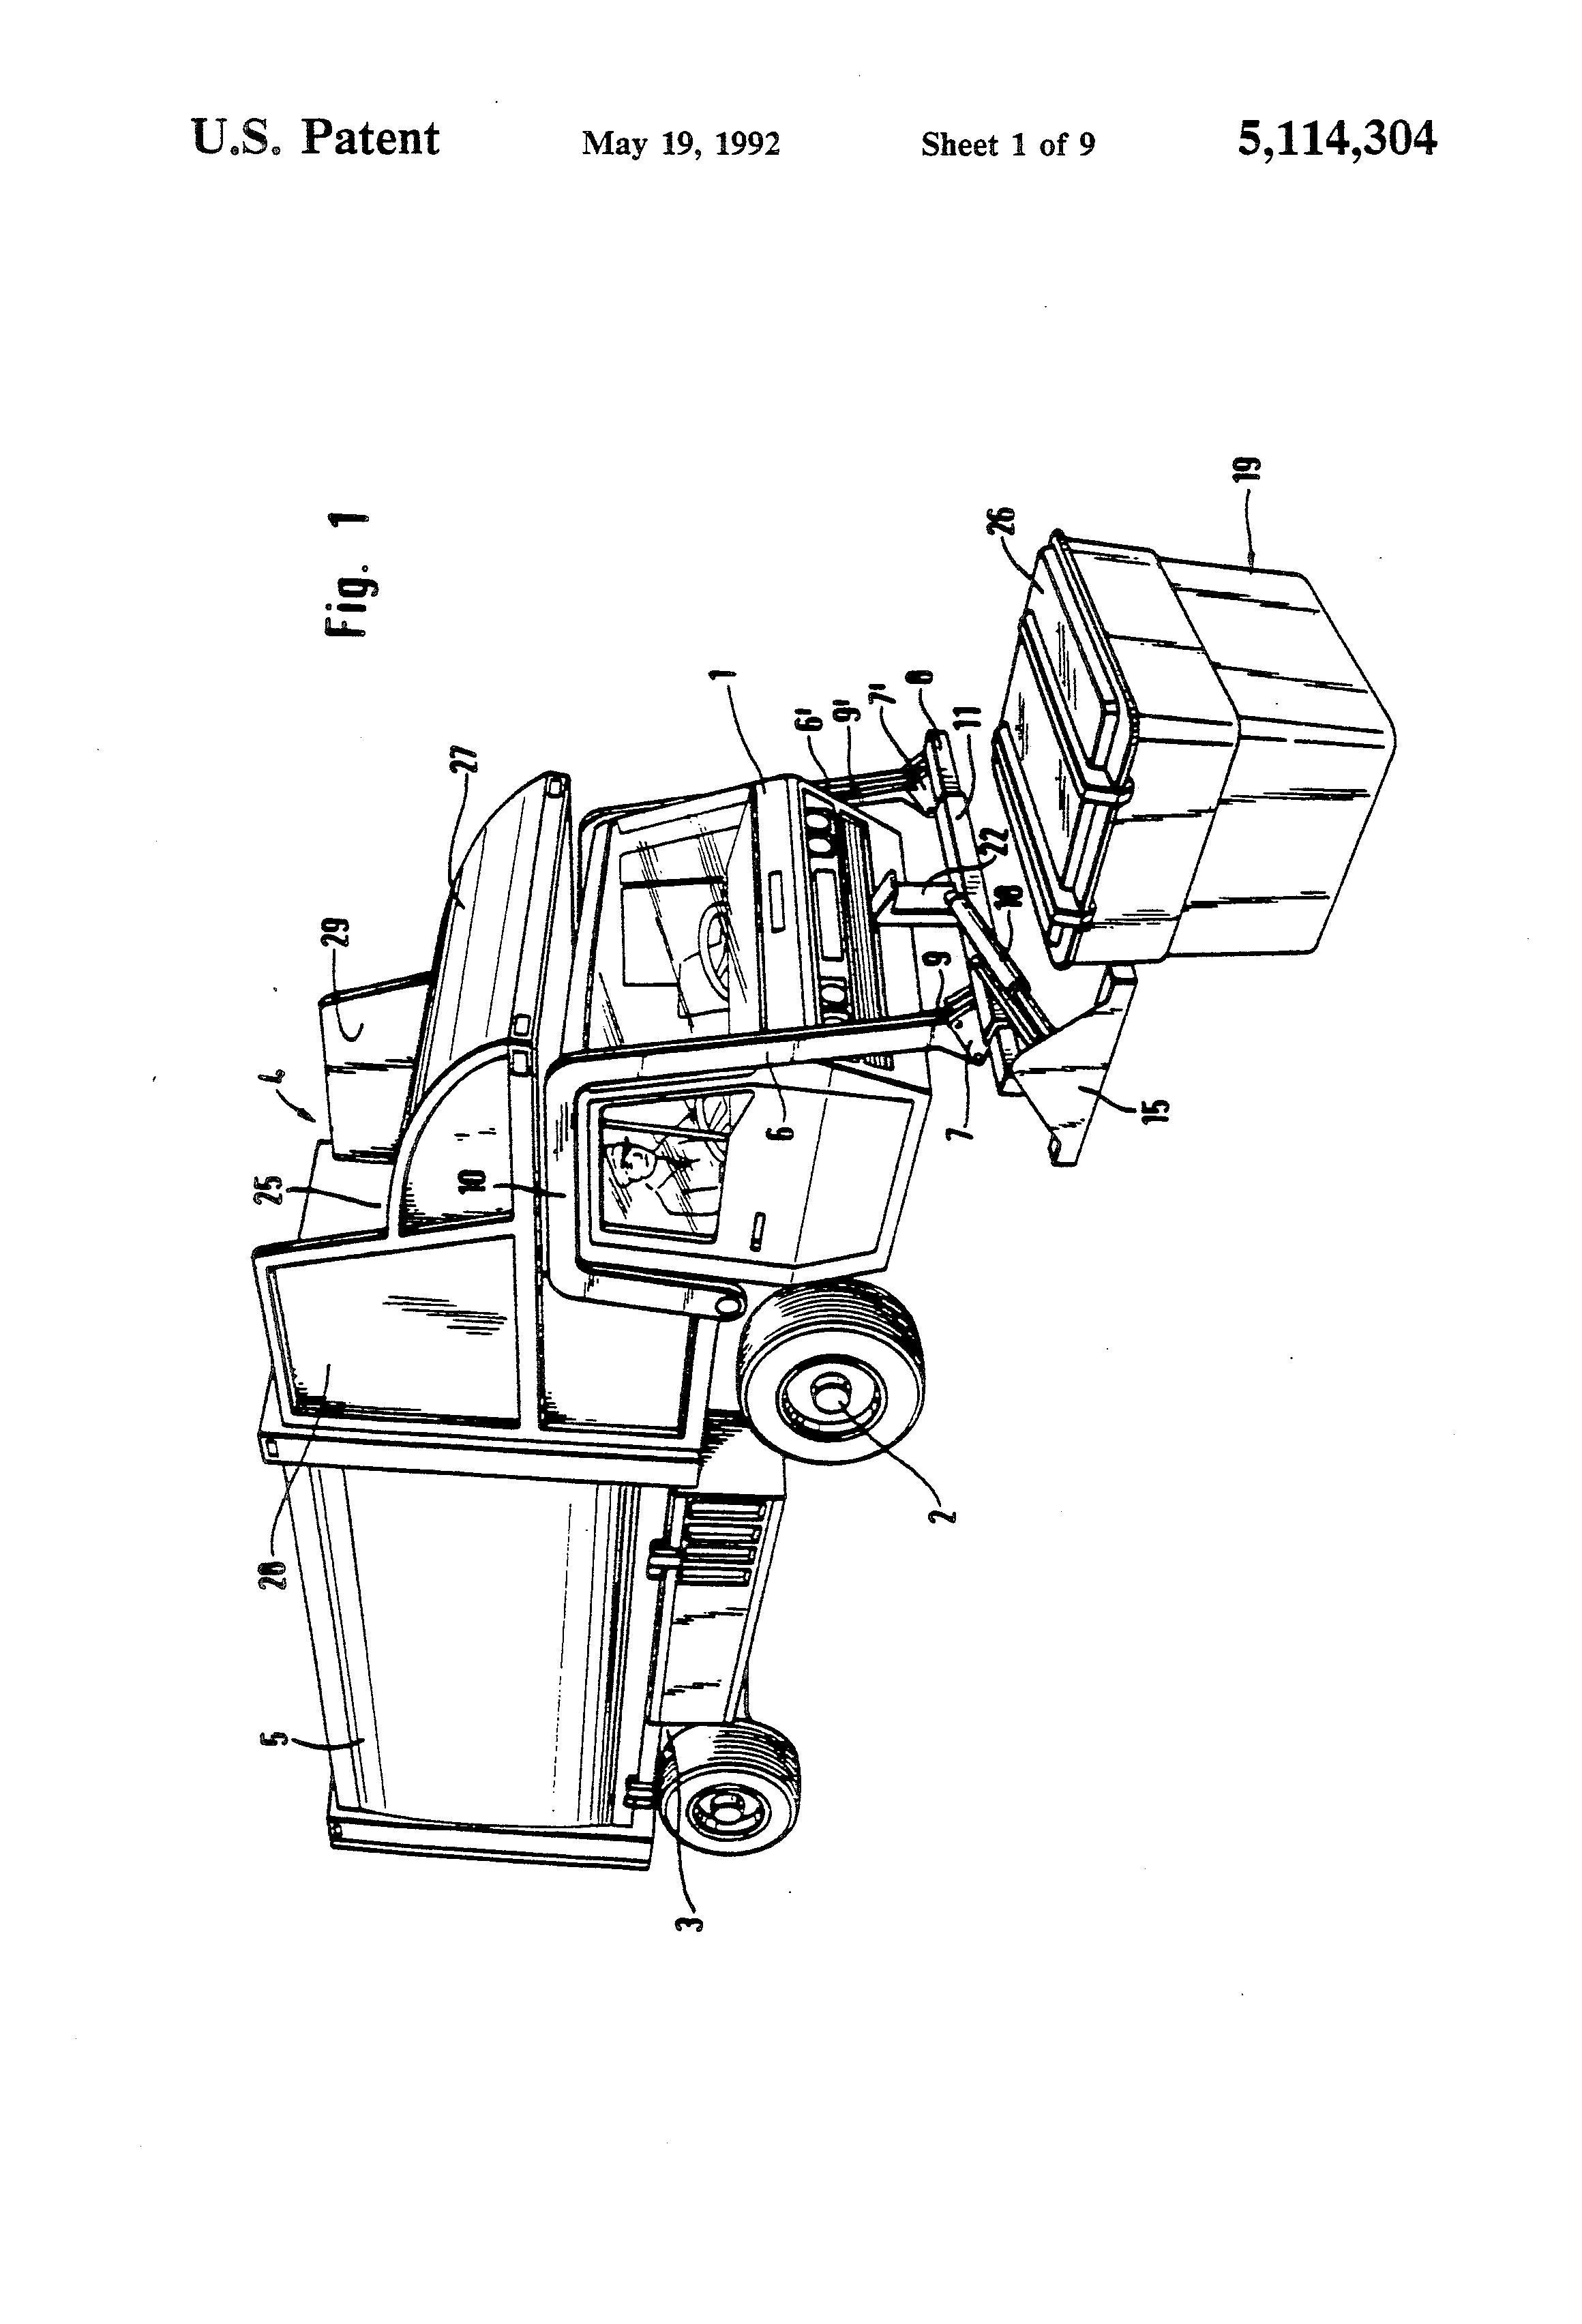 Outstanding Diagram Of 2 4 Liter Alero Engine Wiring Diagram Wiring Cloud Grayisramohammedshrineorg